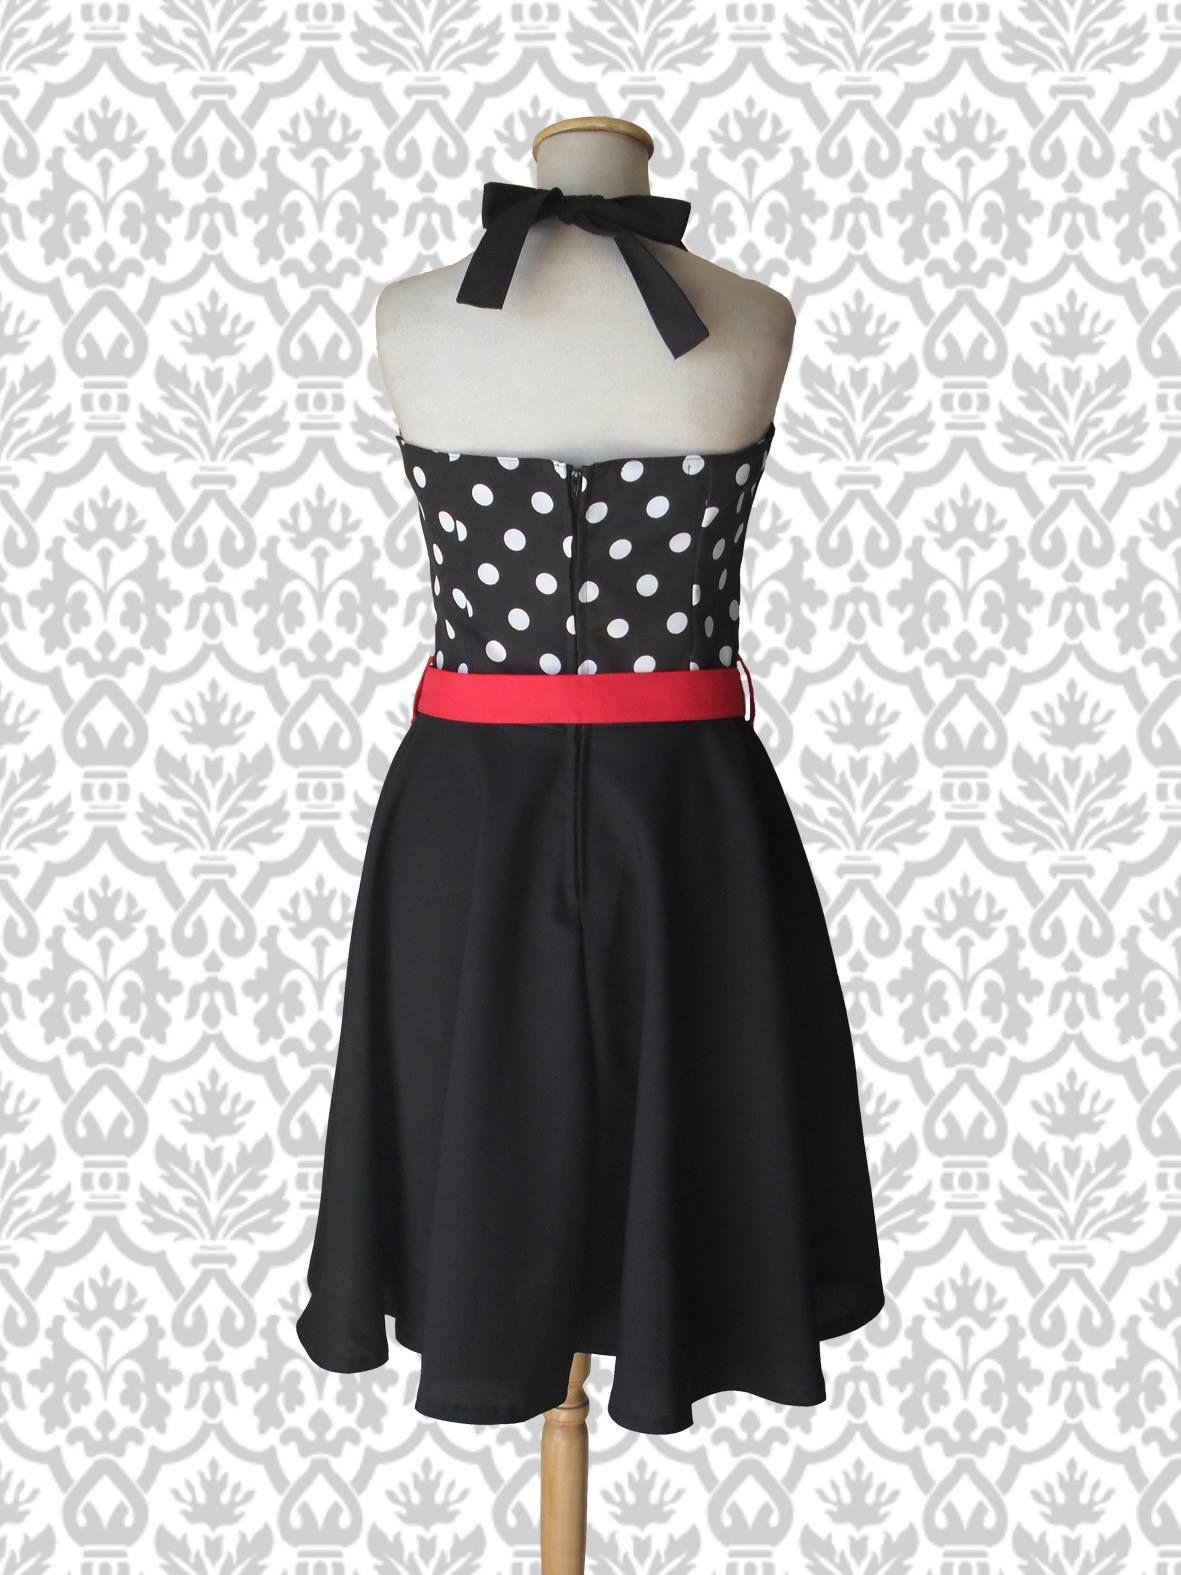 Vest Lucy Lunares grandes (atrás)  #pinup #vestidopinup #pinupdress #polkadot #lunares #vestidolunares #vestidoplato #ropa #indumentaria #pinup